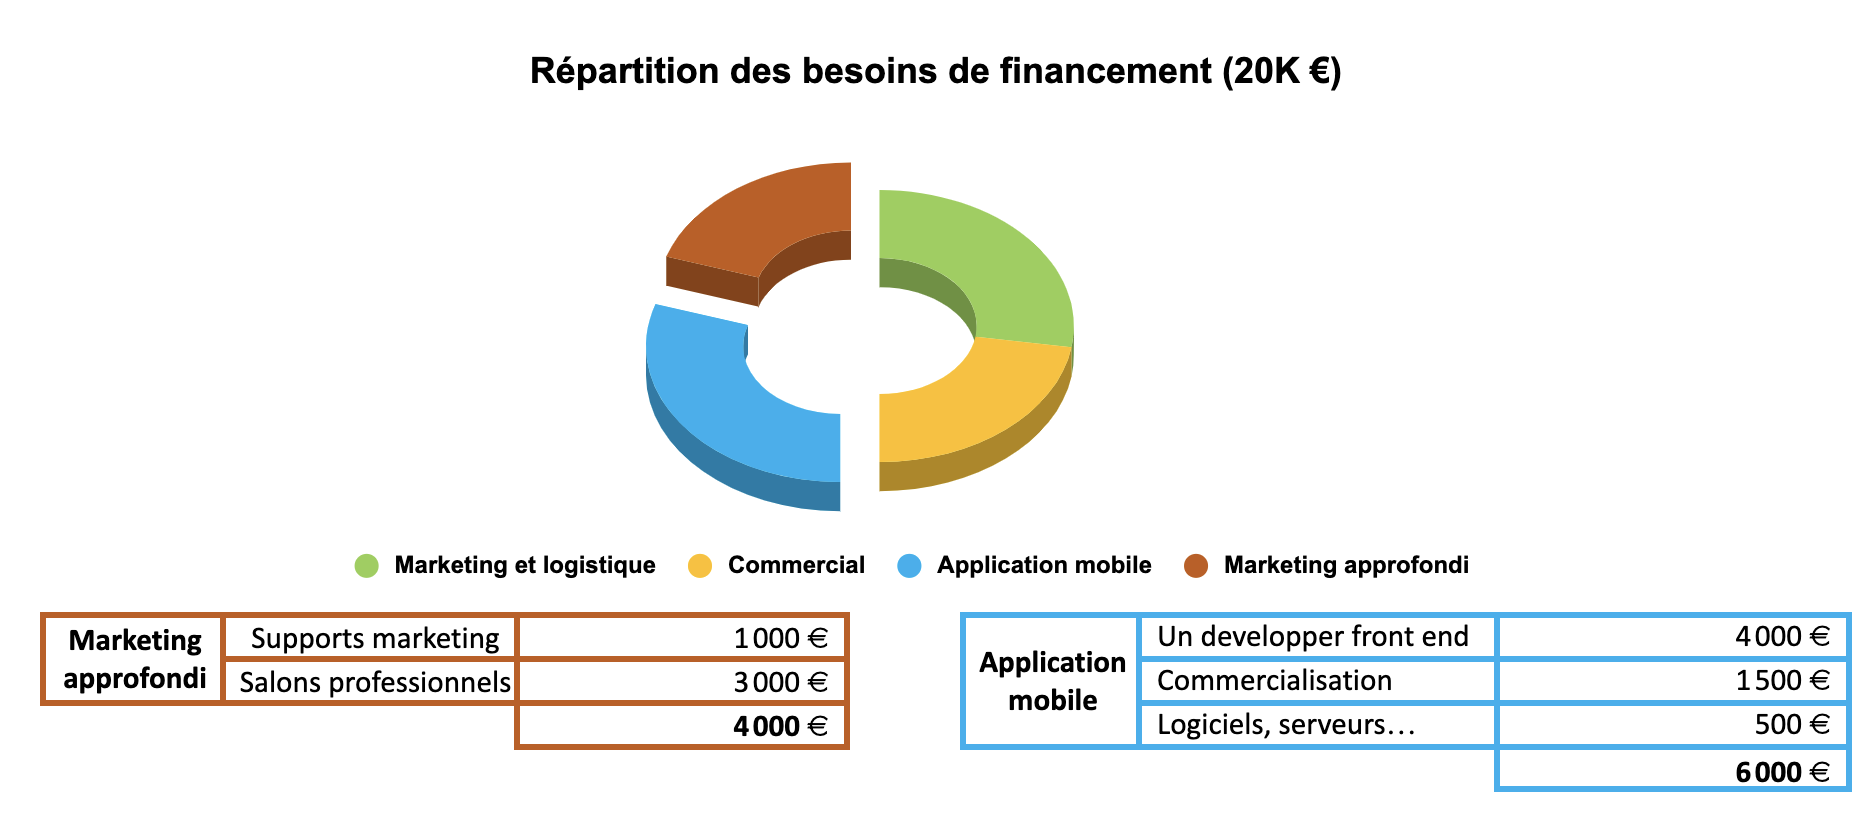 Besoin de financement (2)